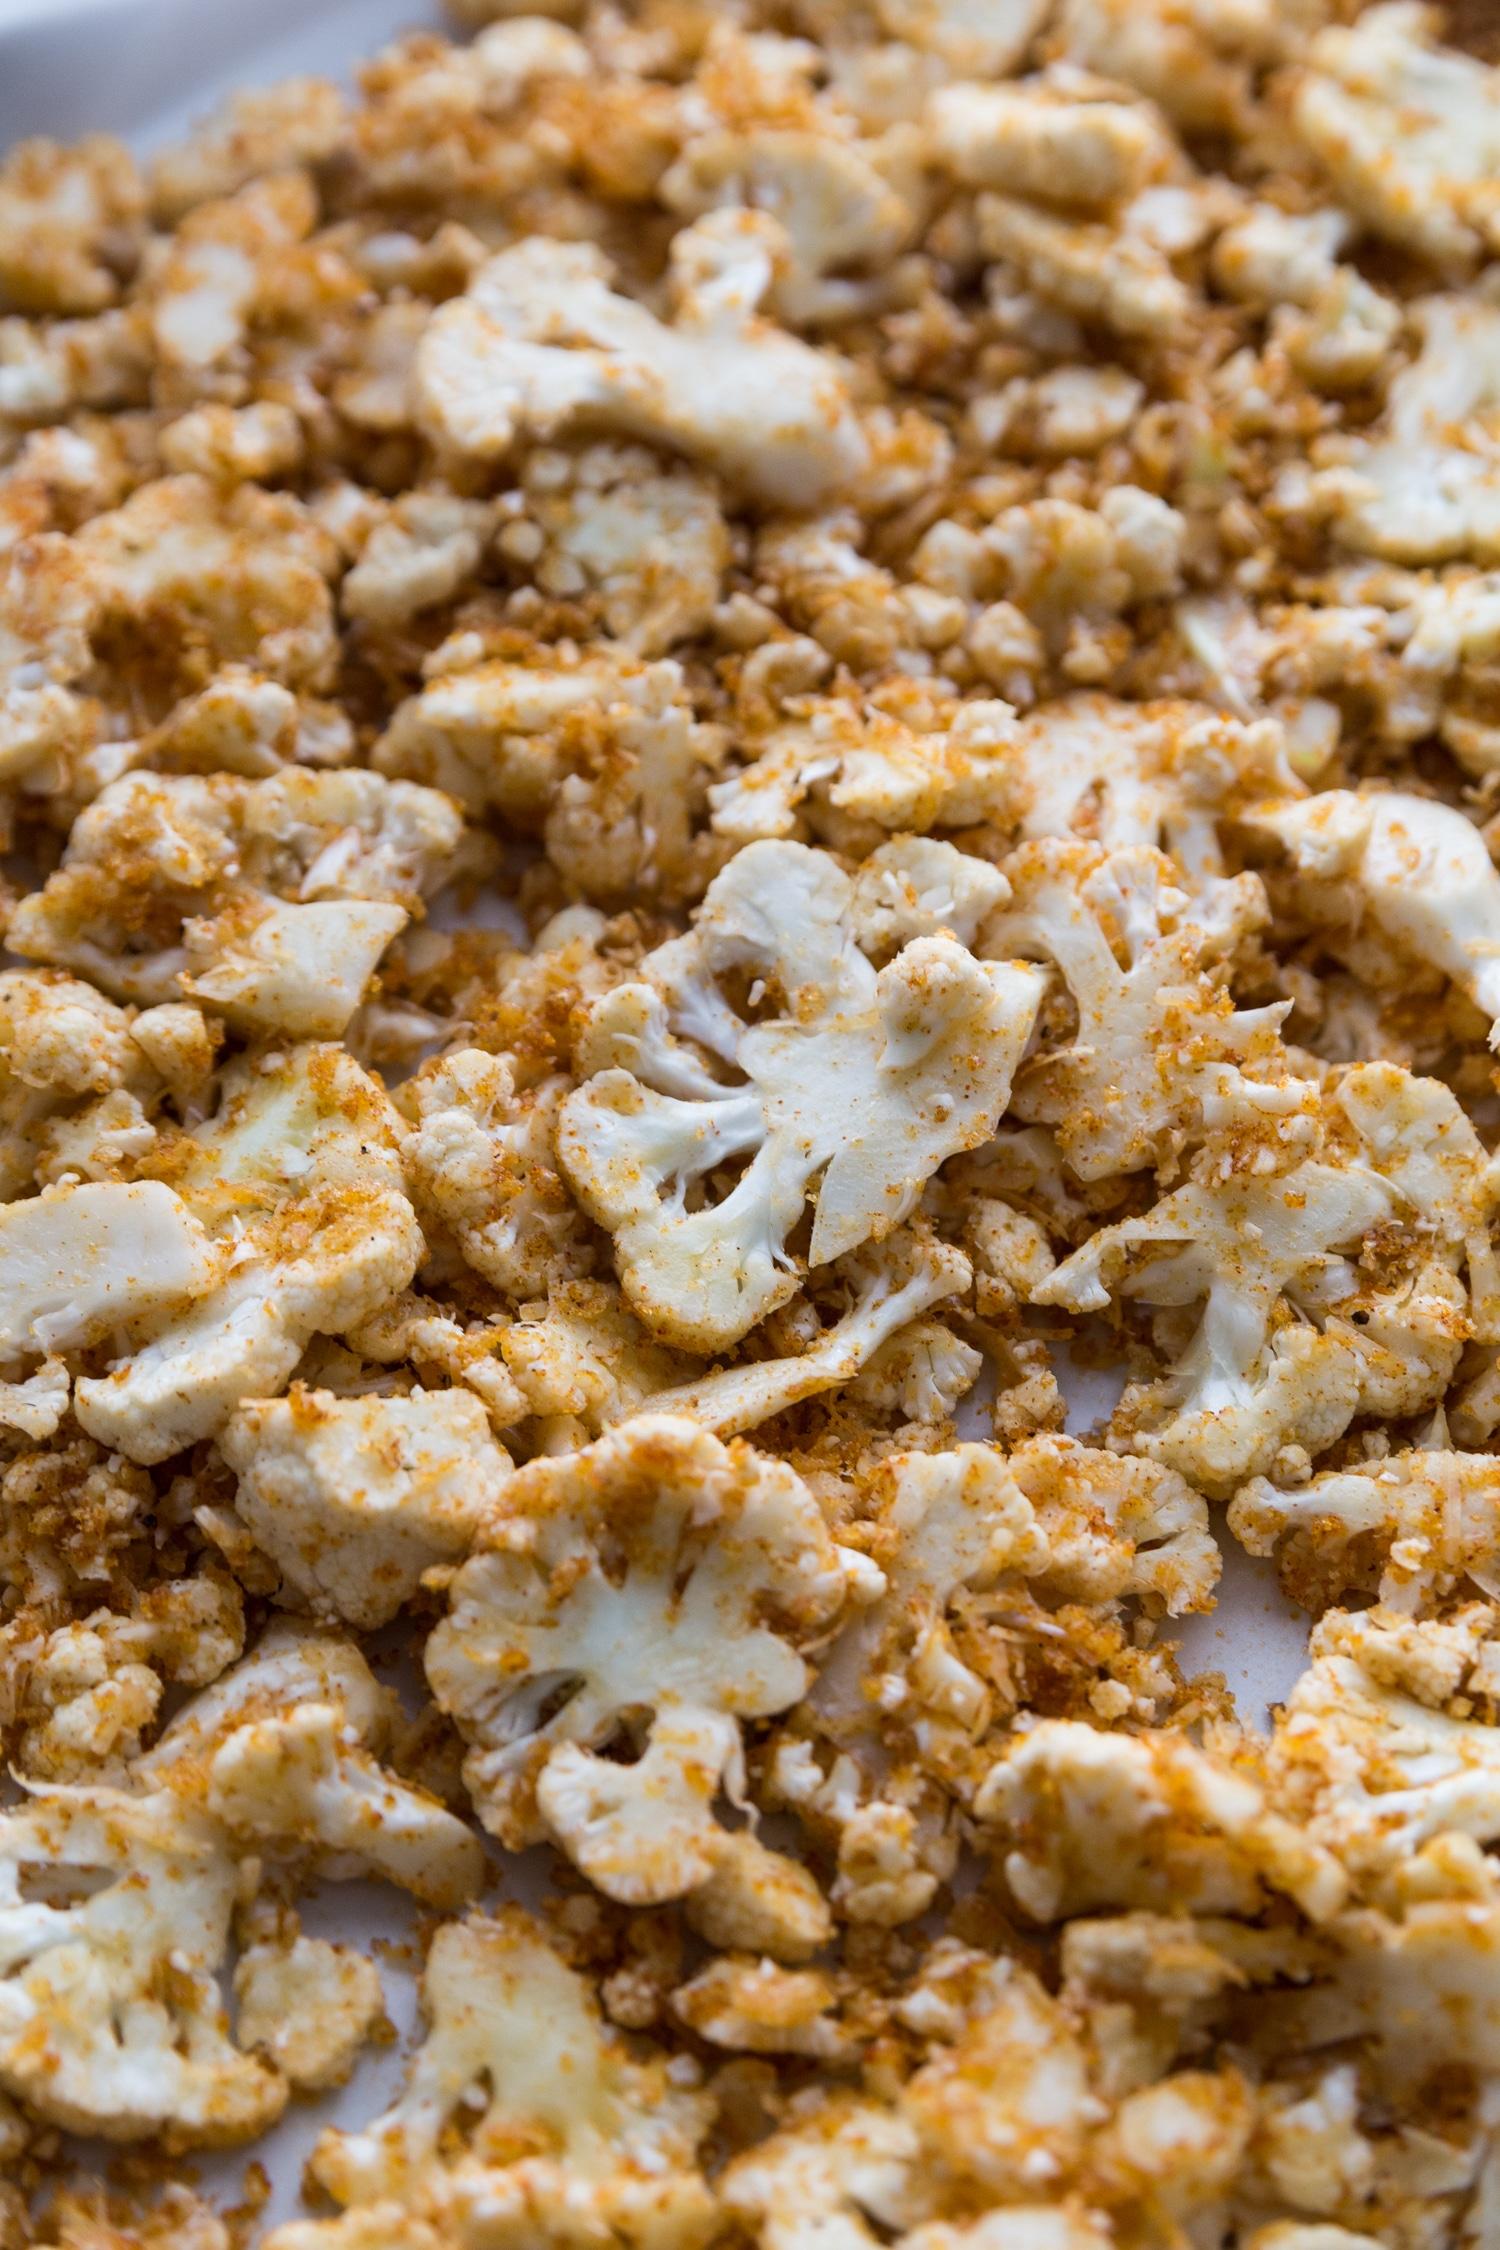 Cauliflower coated in a pork panko bread crumb mixture ans seasonings on a rimmed sheet pan.